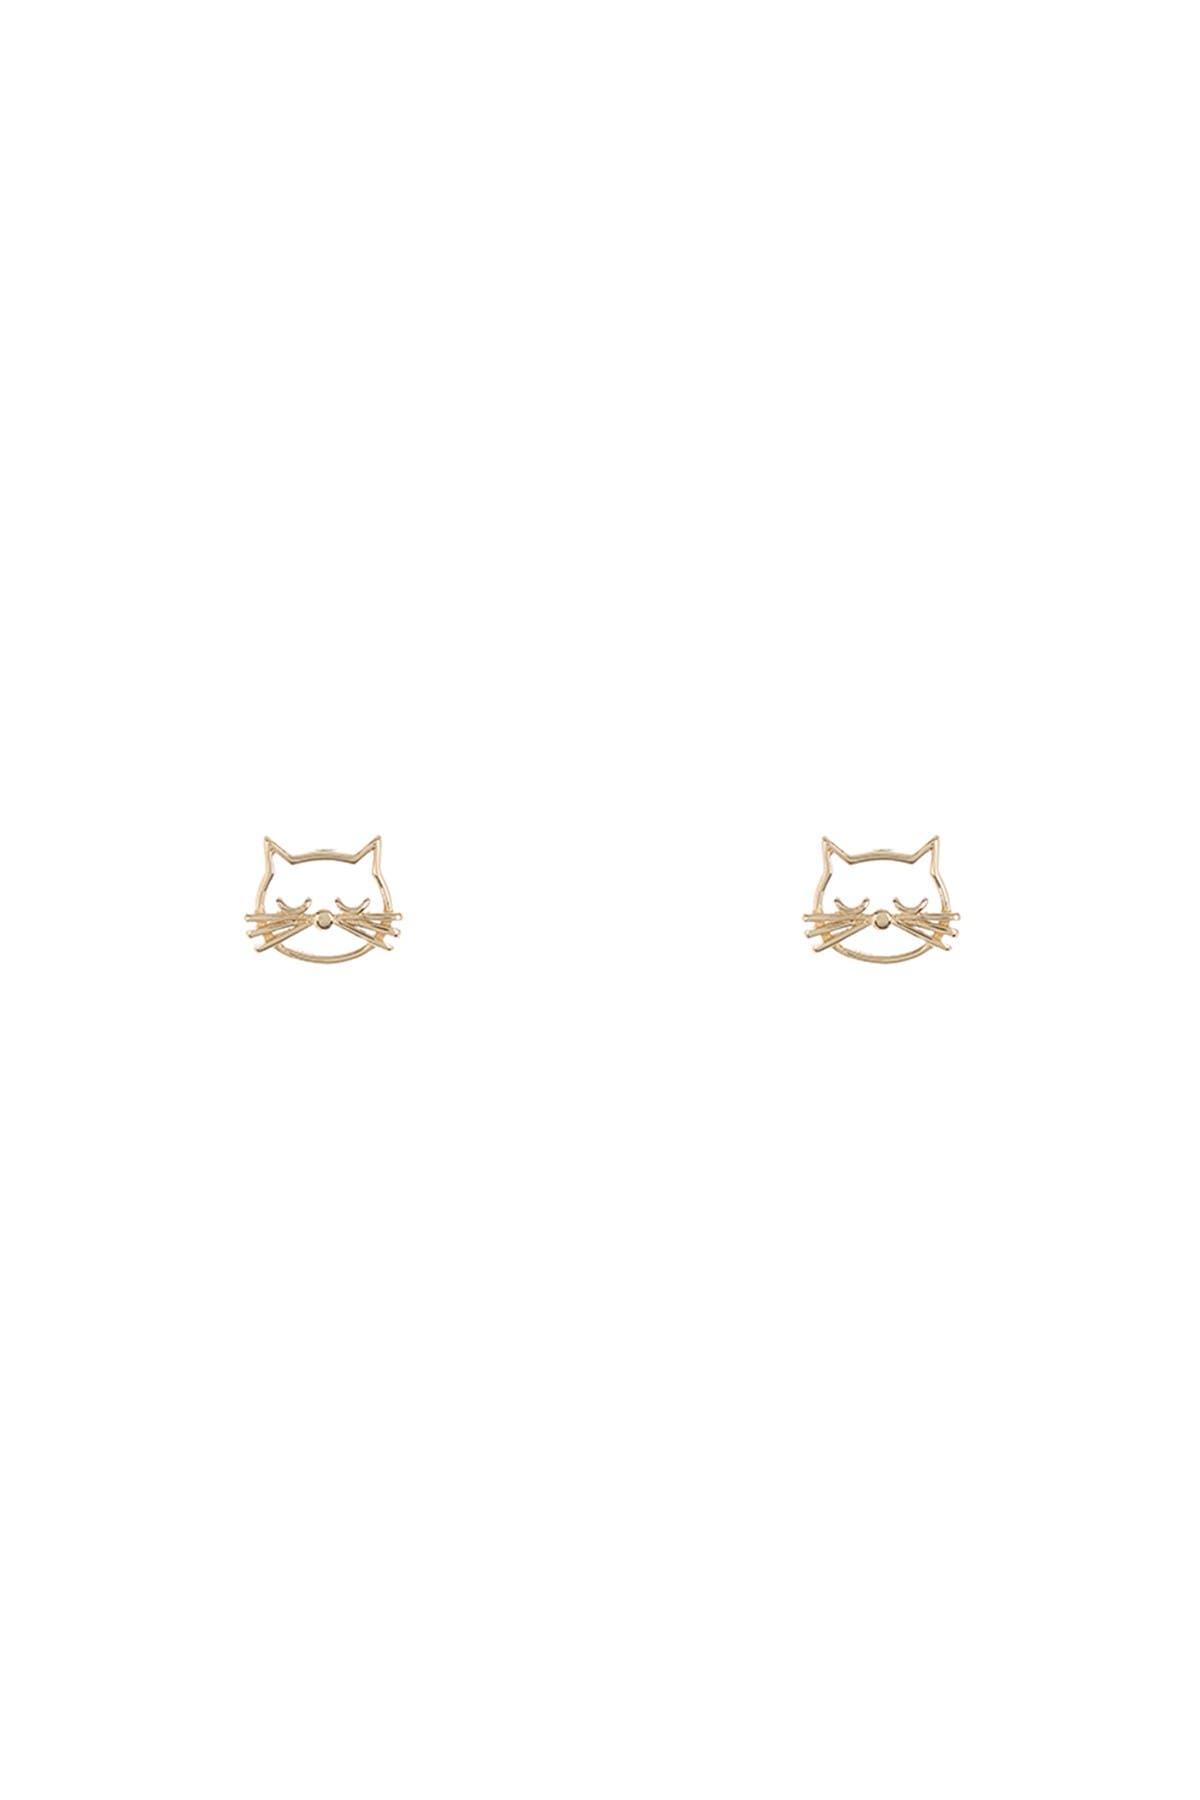 Image of KARAT RUSH 14K Yellow Gold Mini Cat Stud Earrings